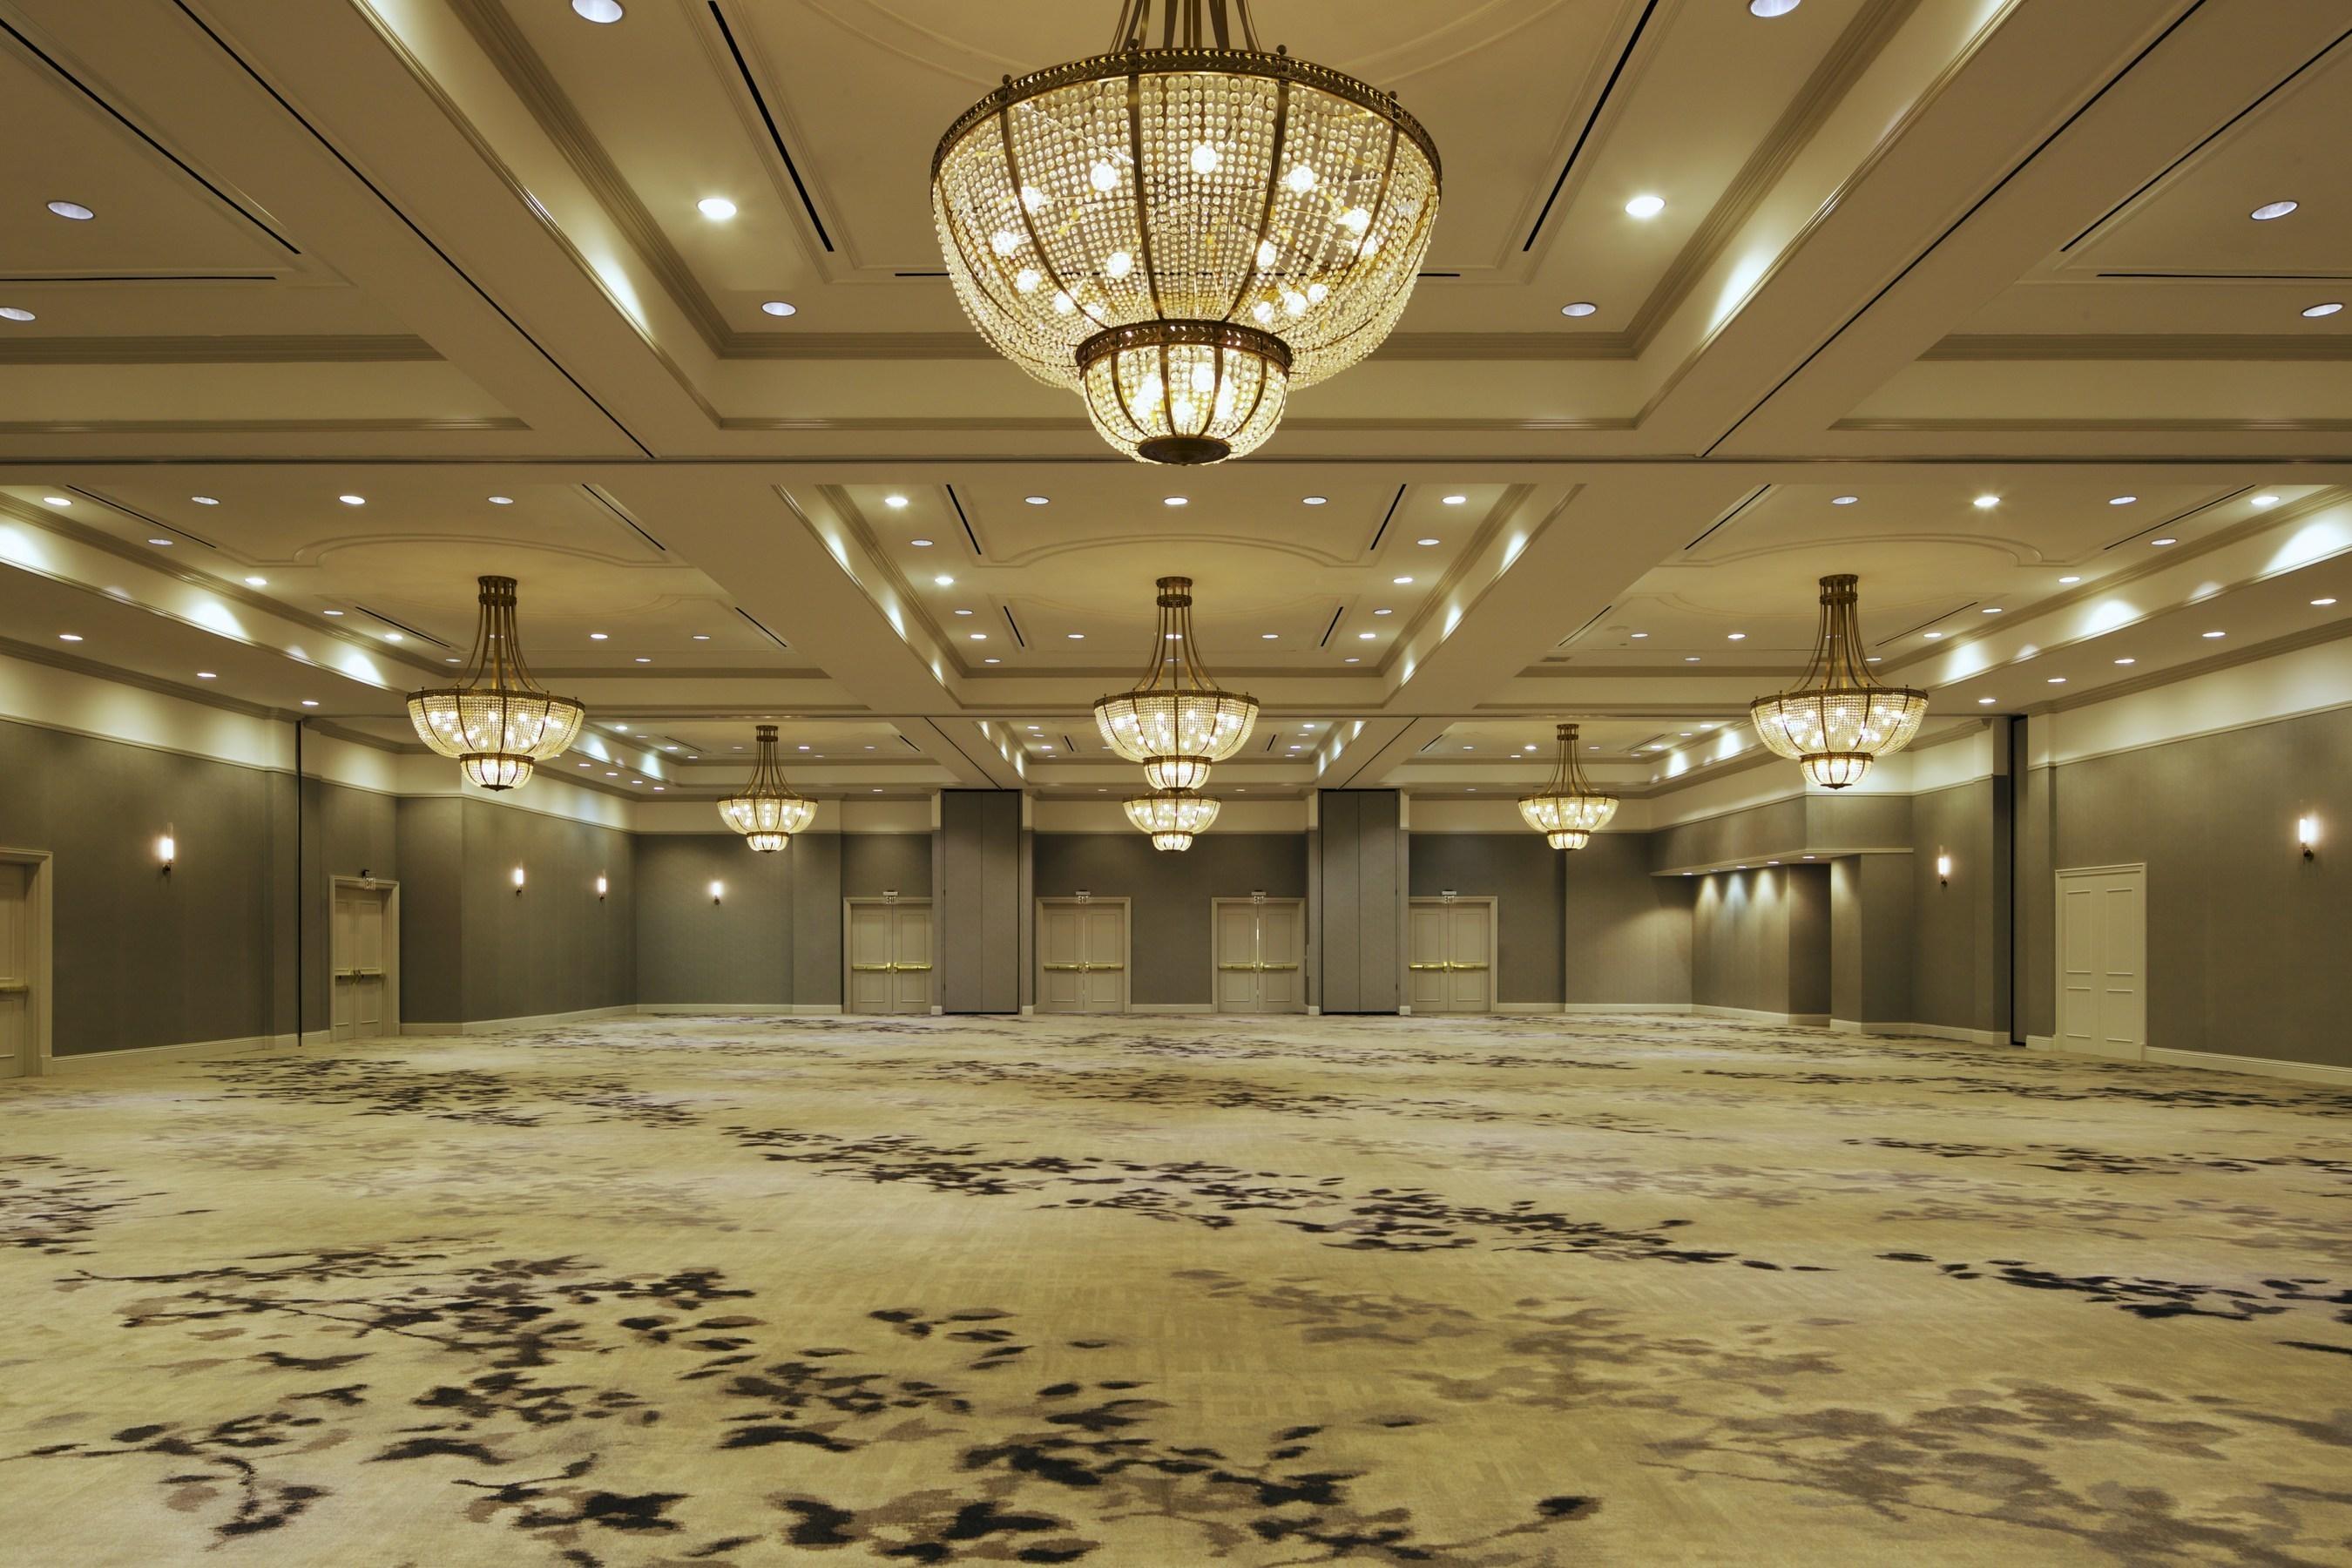 The Grand Ballroom at the JW Marriott Miami